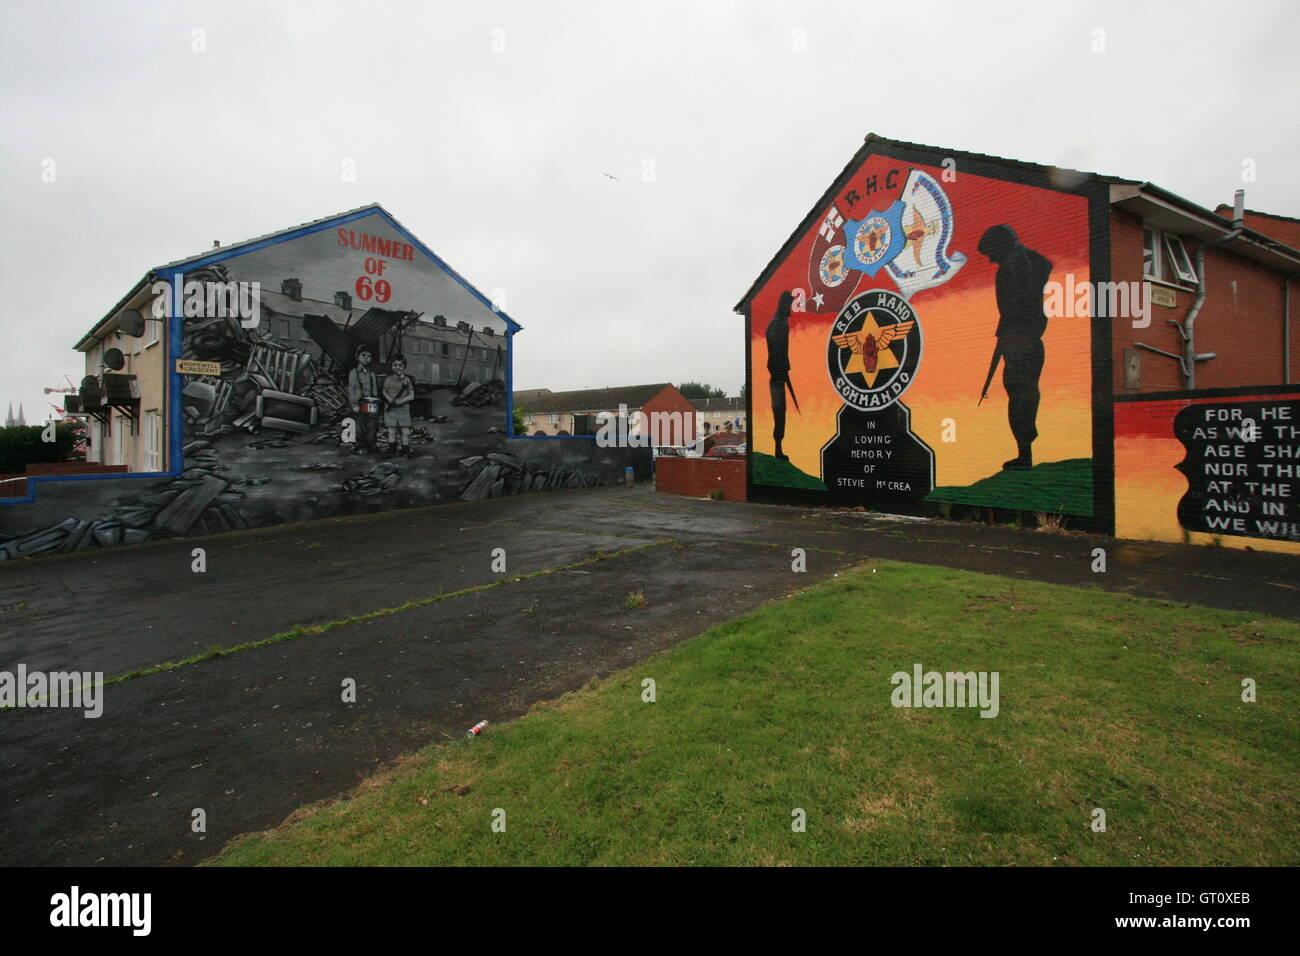 Unionist political murals on Shankill Road, Belfast, Northern Ireland, UK. - Stock Image